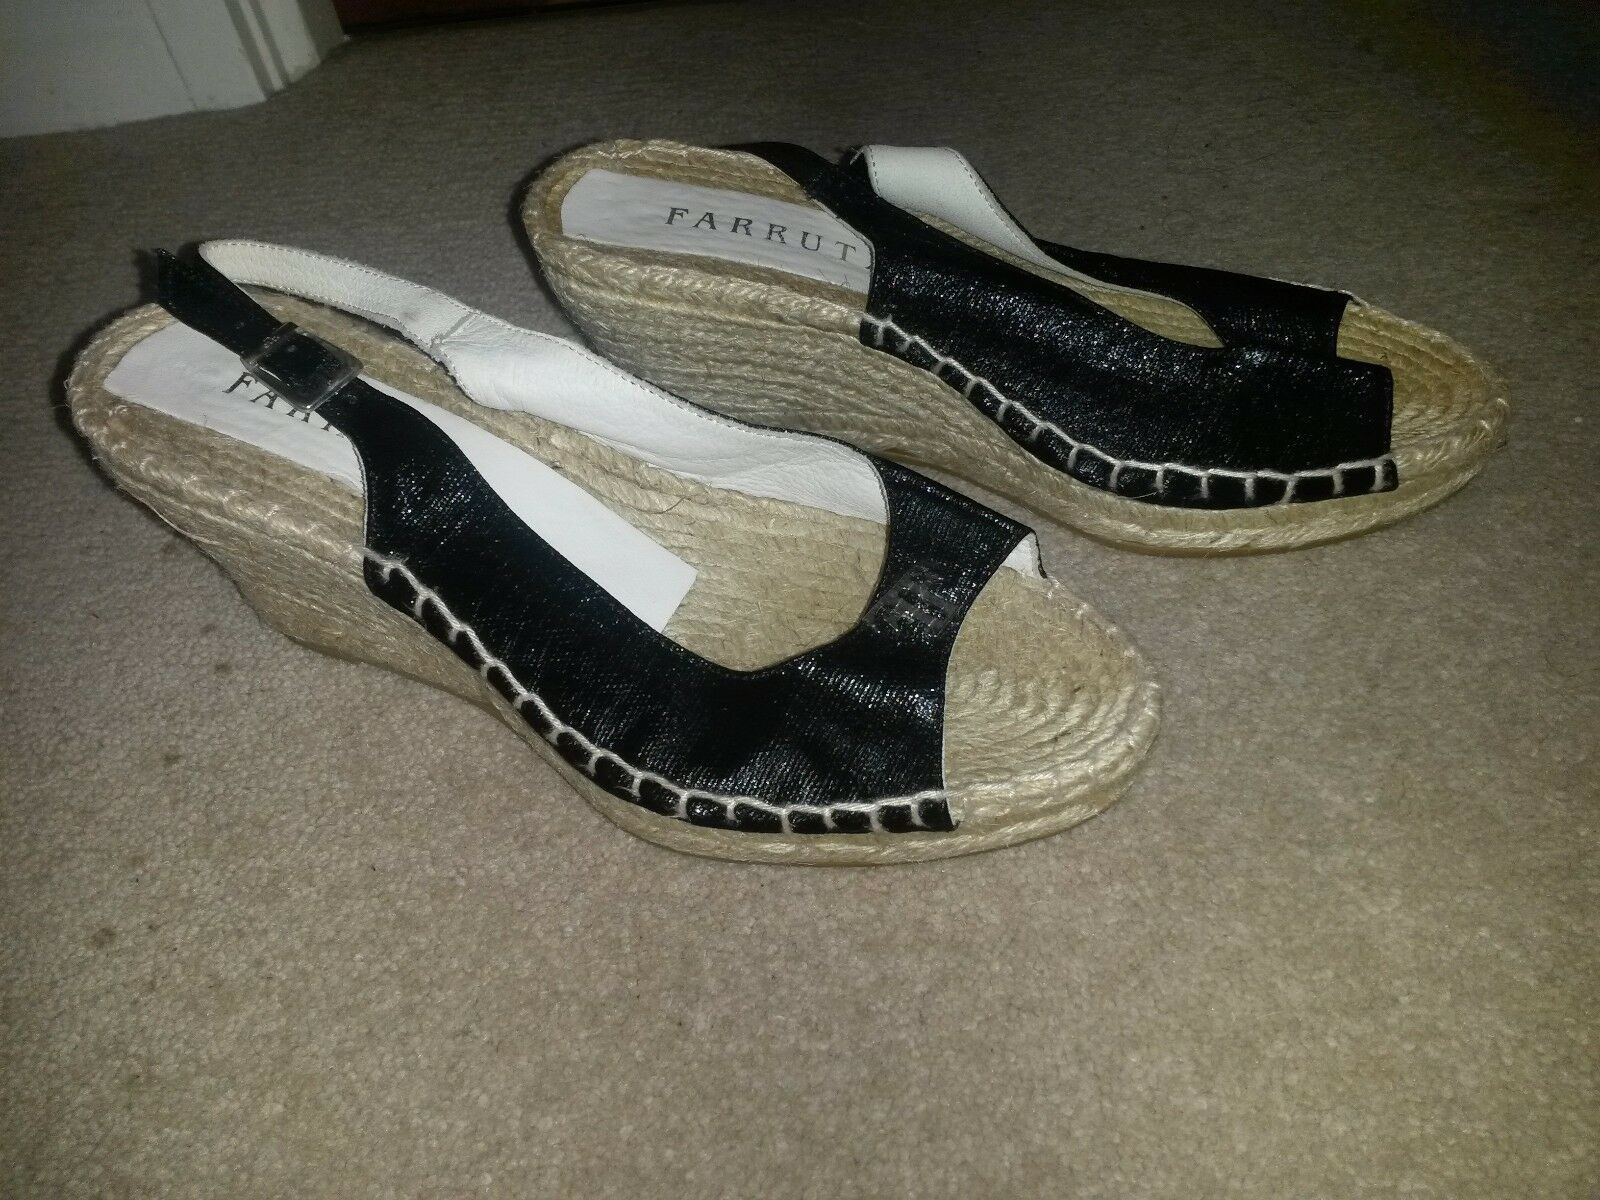 Women shoes. sandals, wedges, summer shoes. Women Size 3.5 (36 EU) 8ac0f5